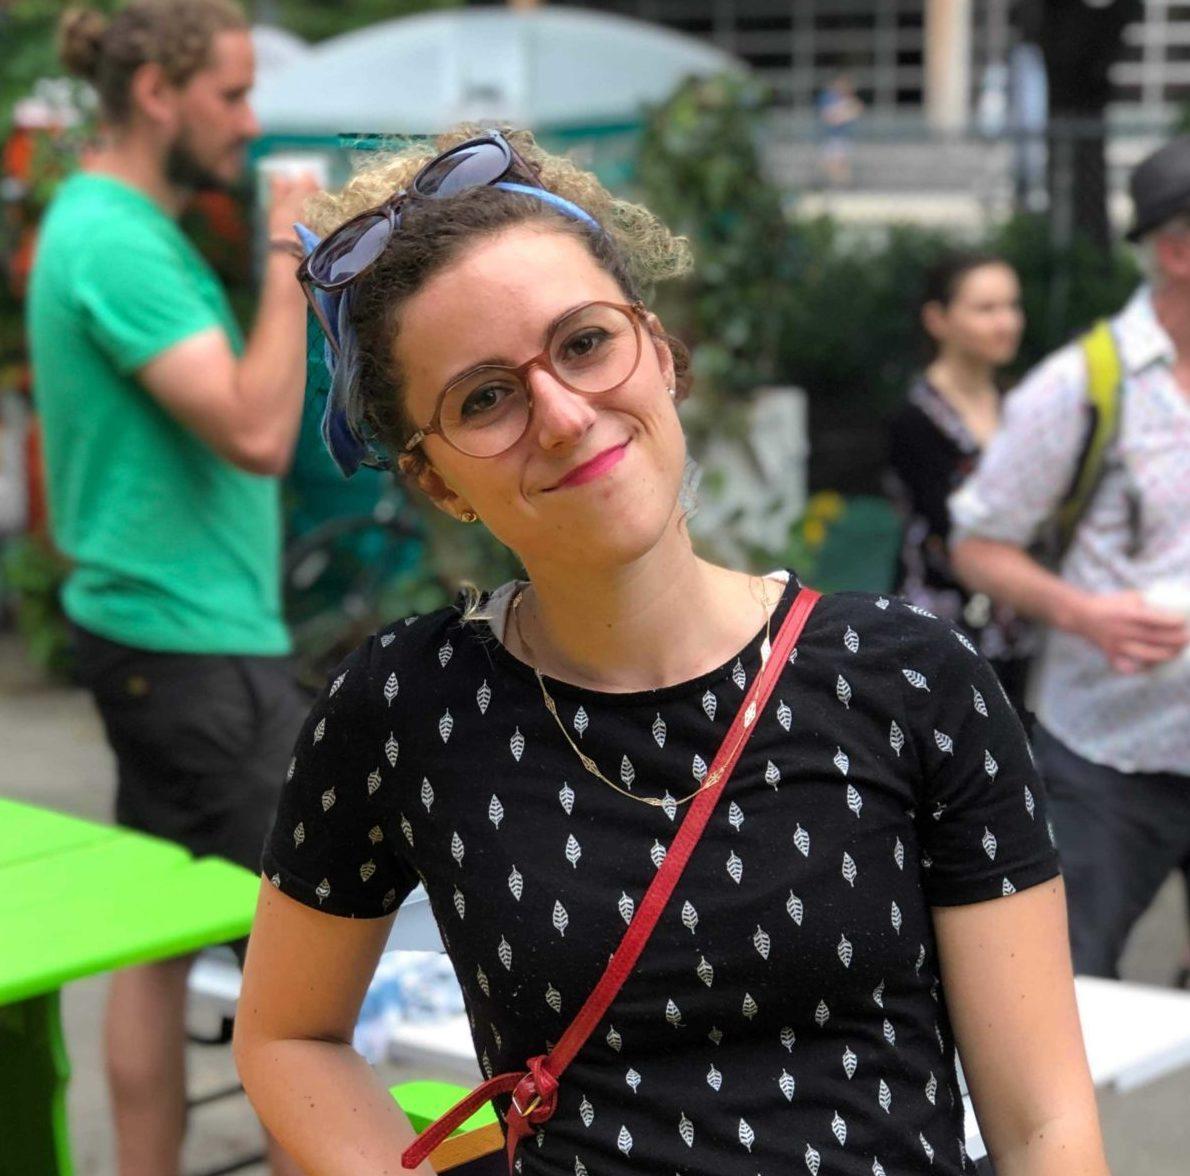 Myriam NicknerHudon